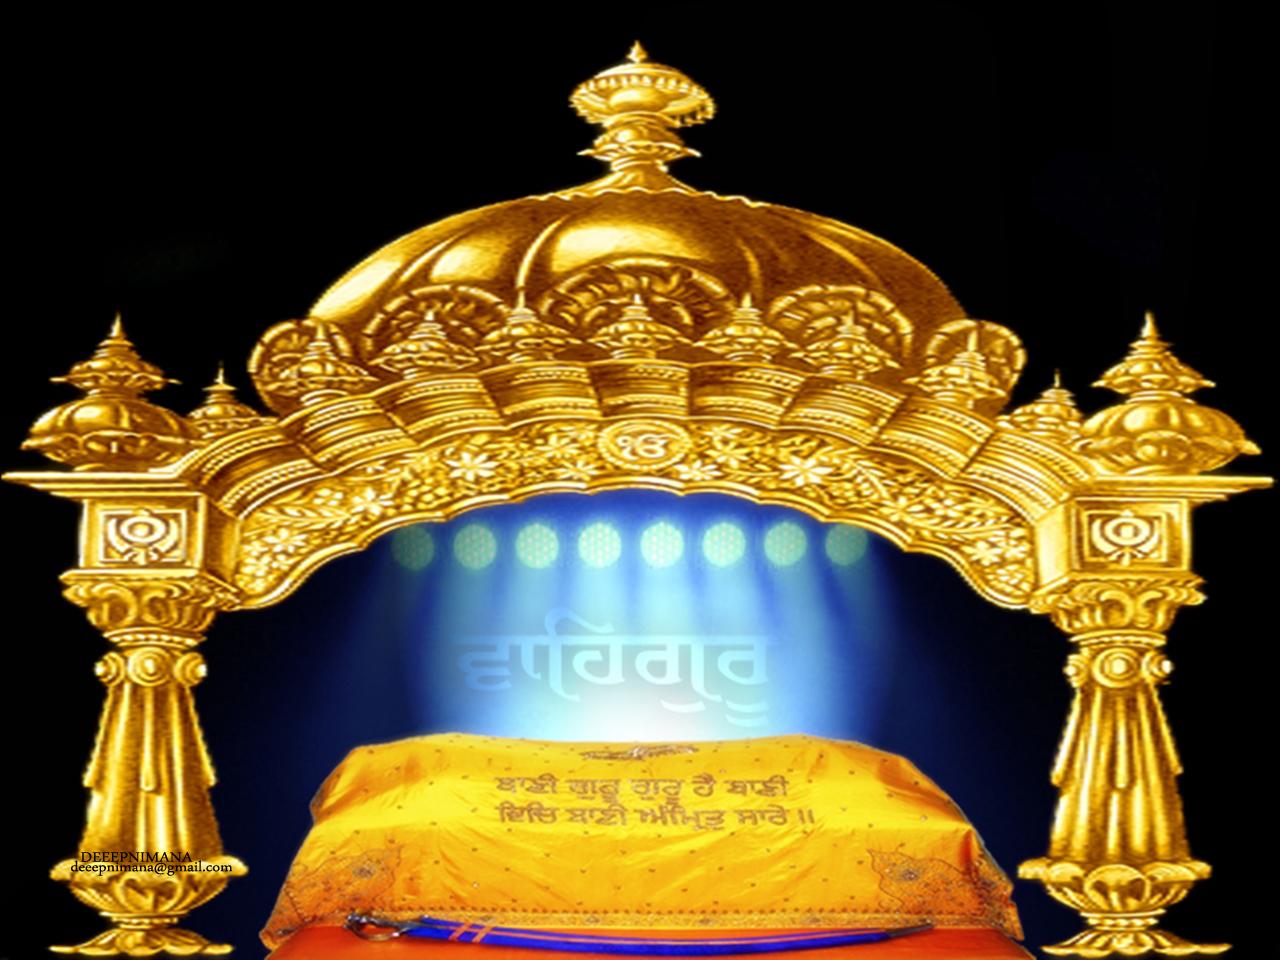 Gurbani shabad kirtan free download: guru granth sahib ji.